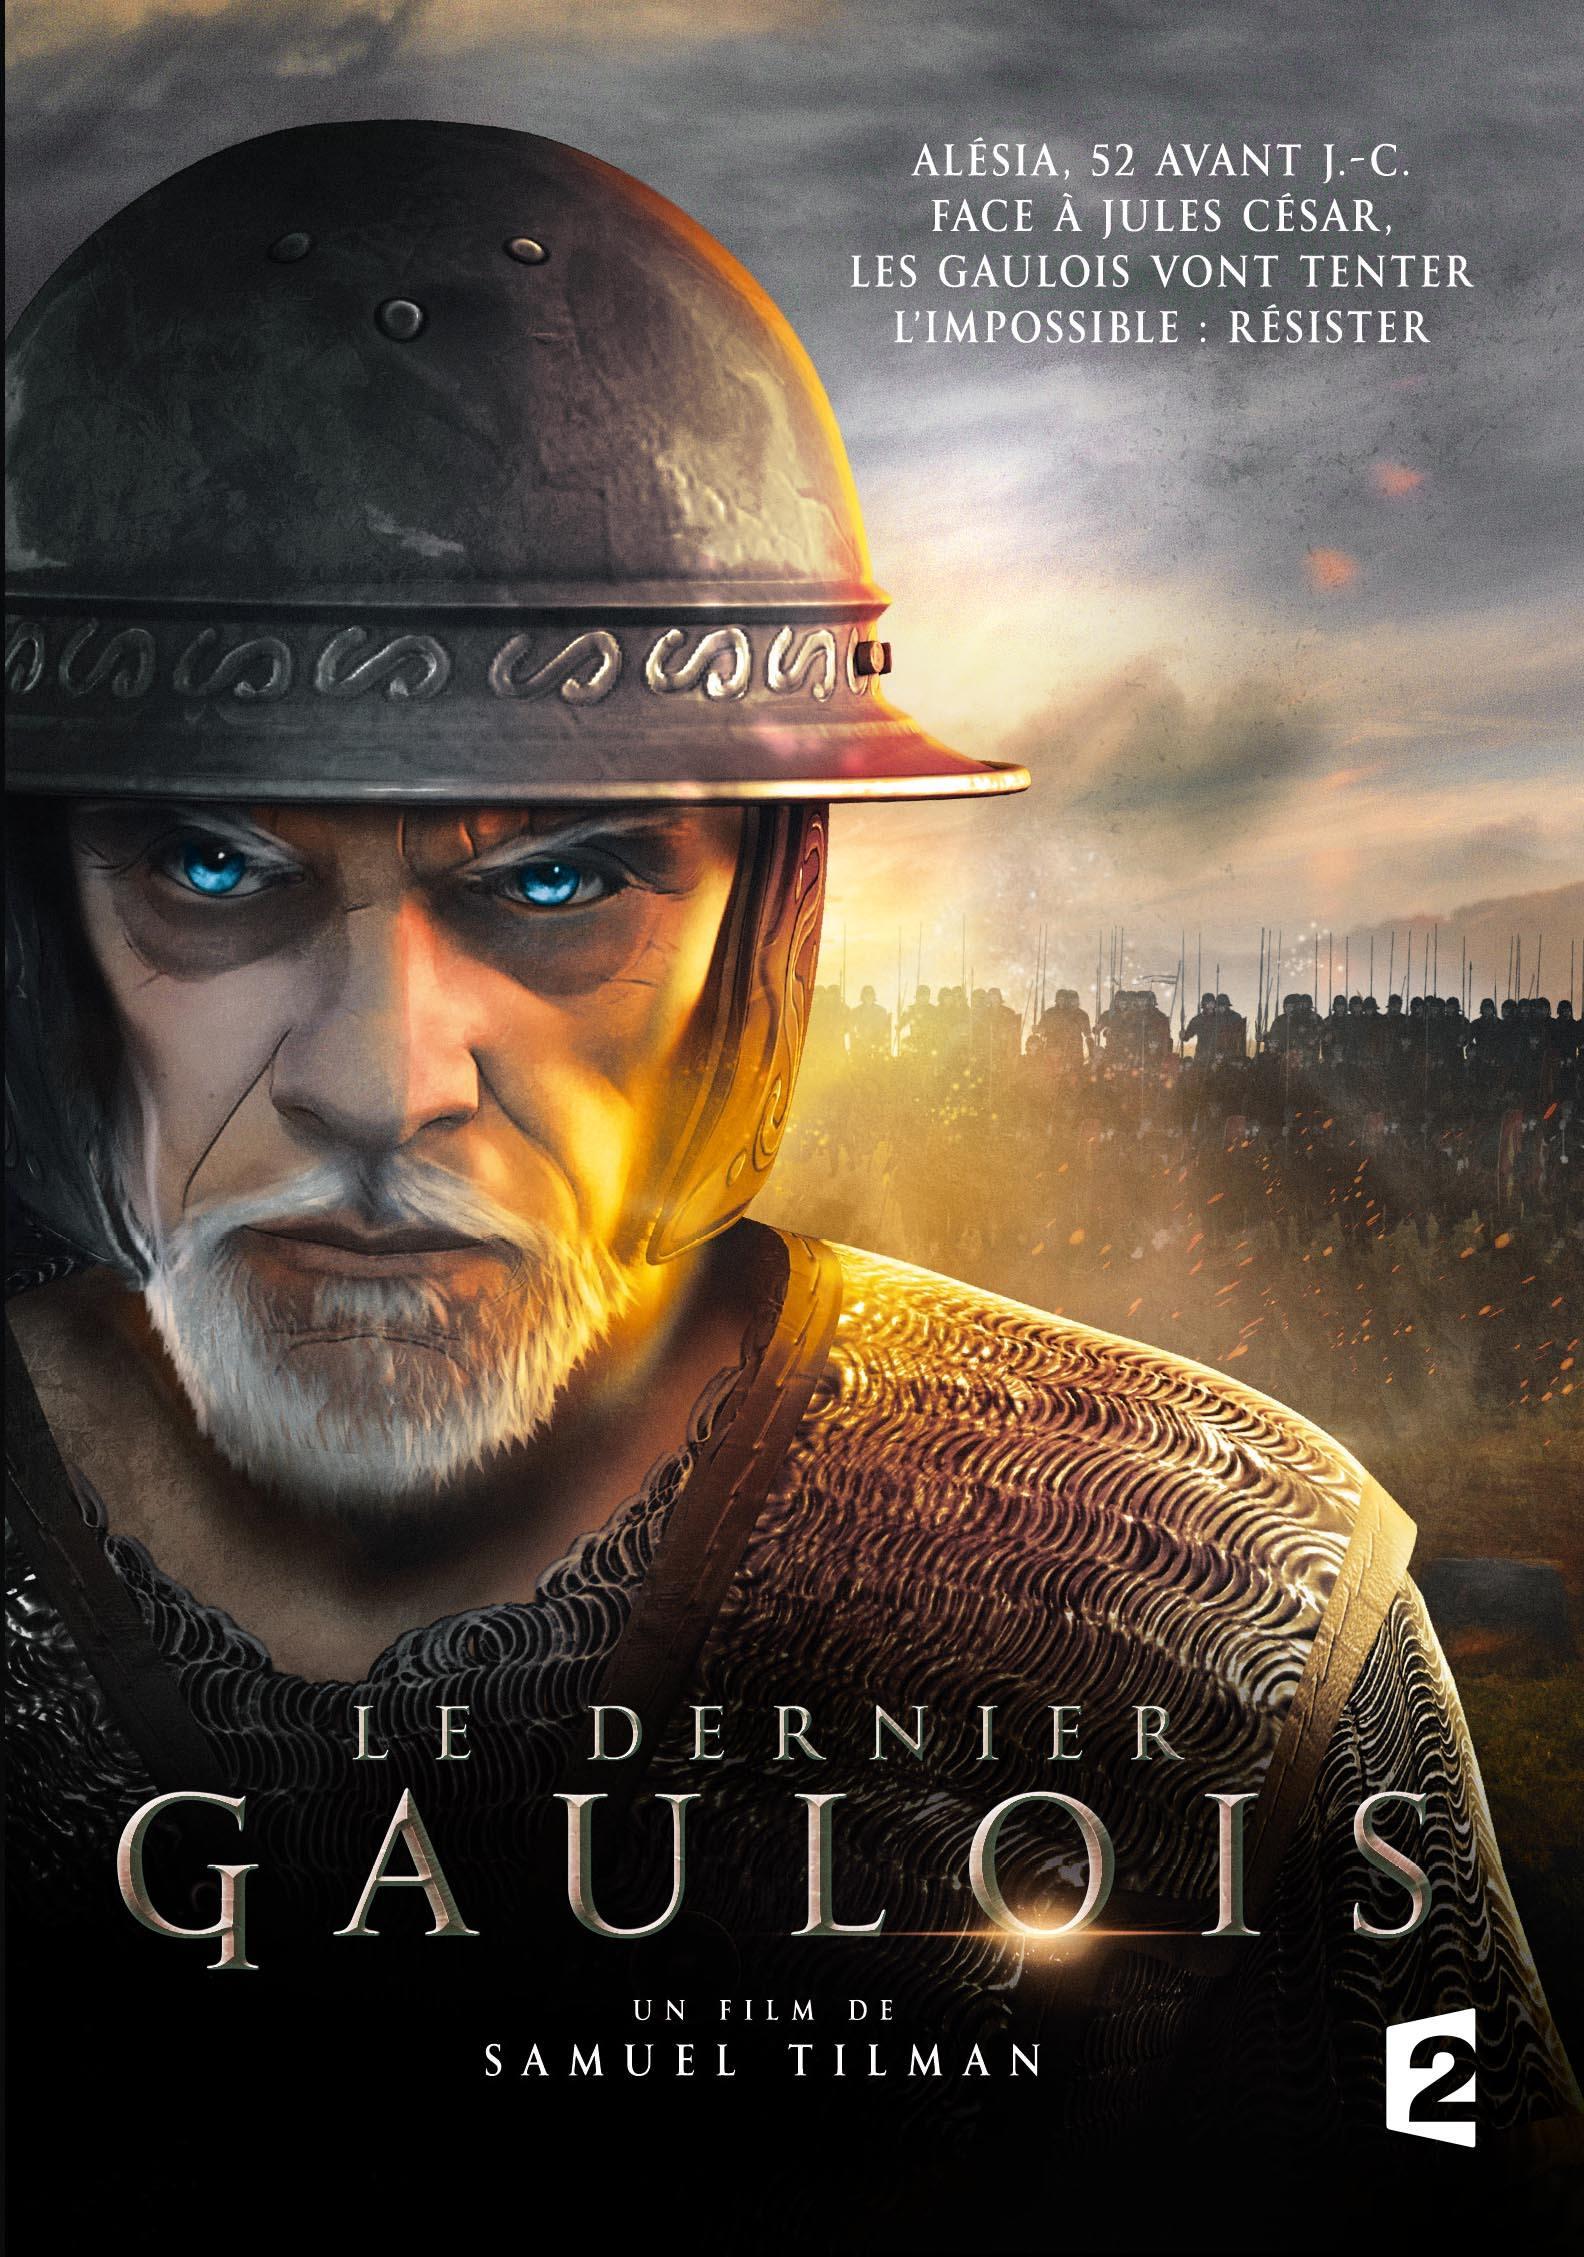 Dernier gaulois (le) - dvd